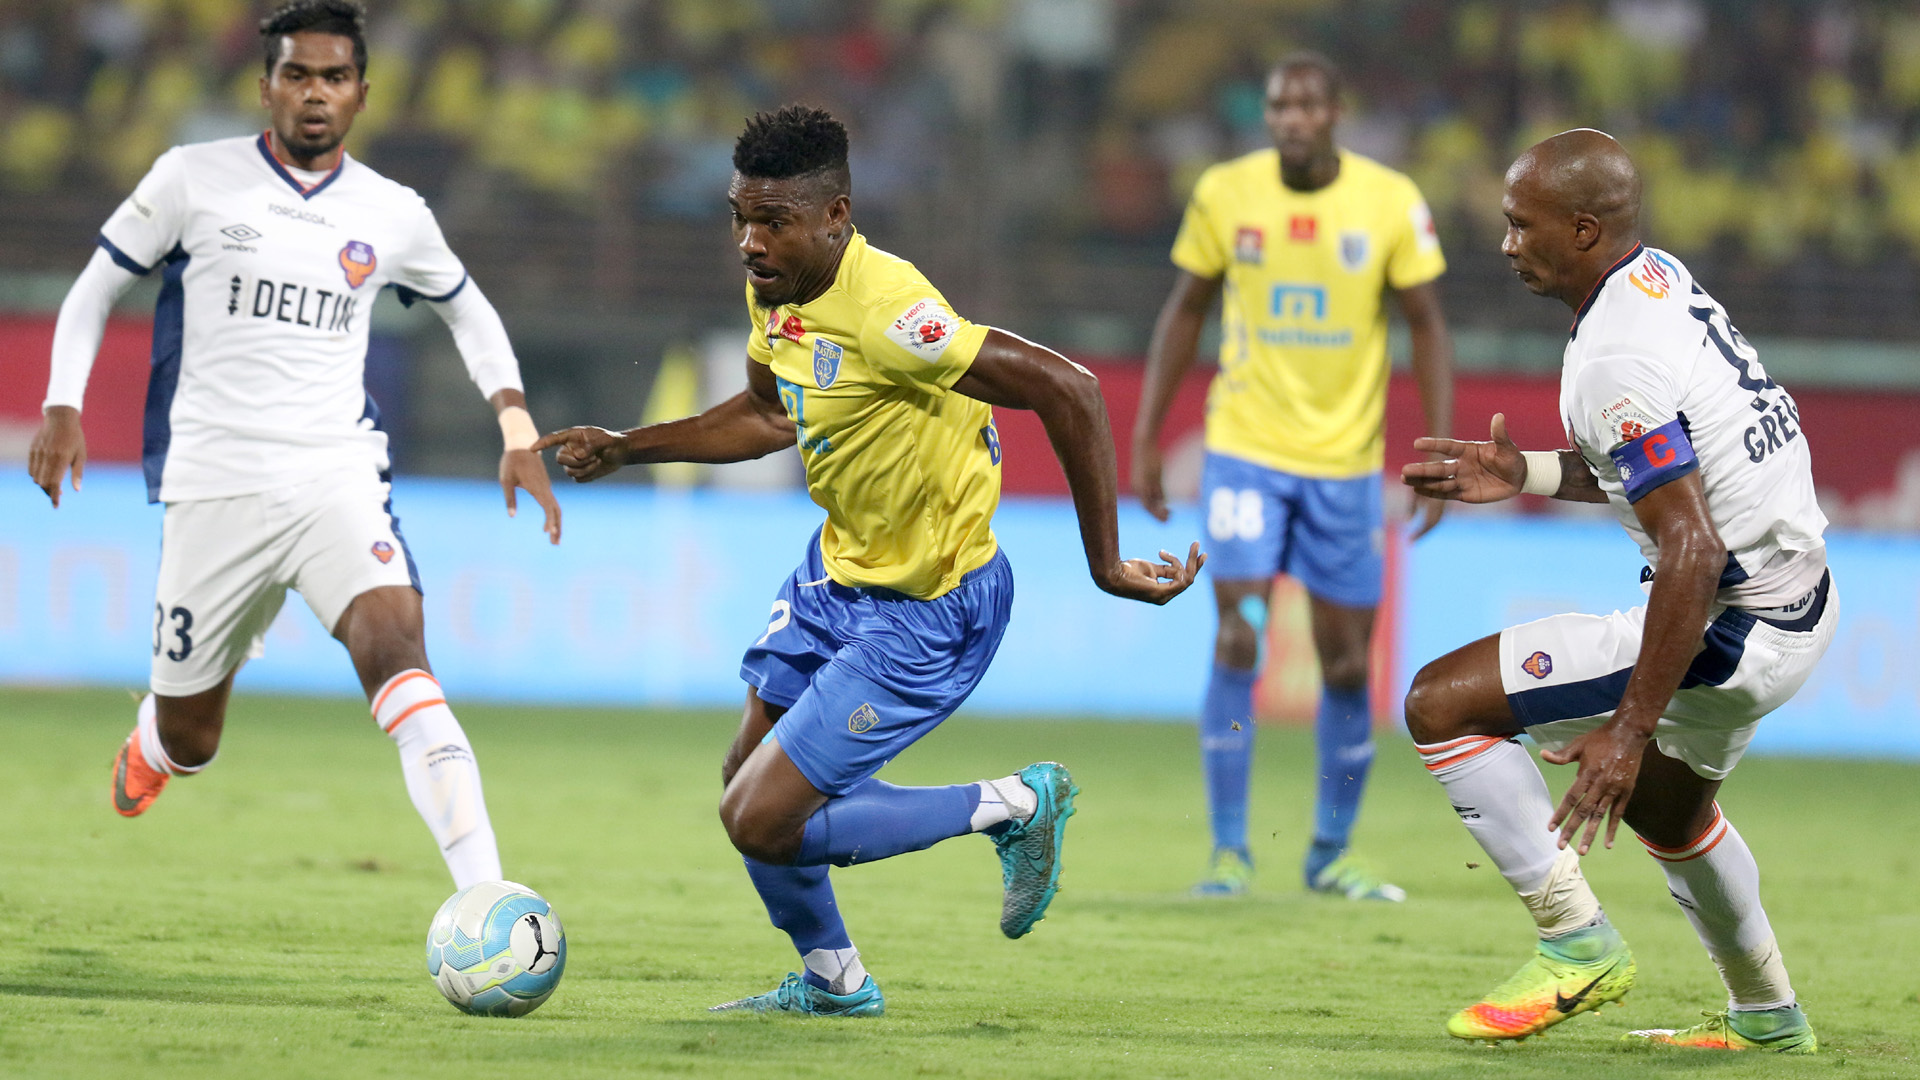 Kervens Belfort Kerala Blasters FC FC Goa ISL season 3 2016